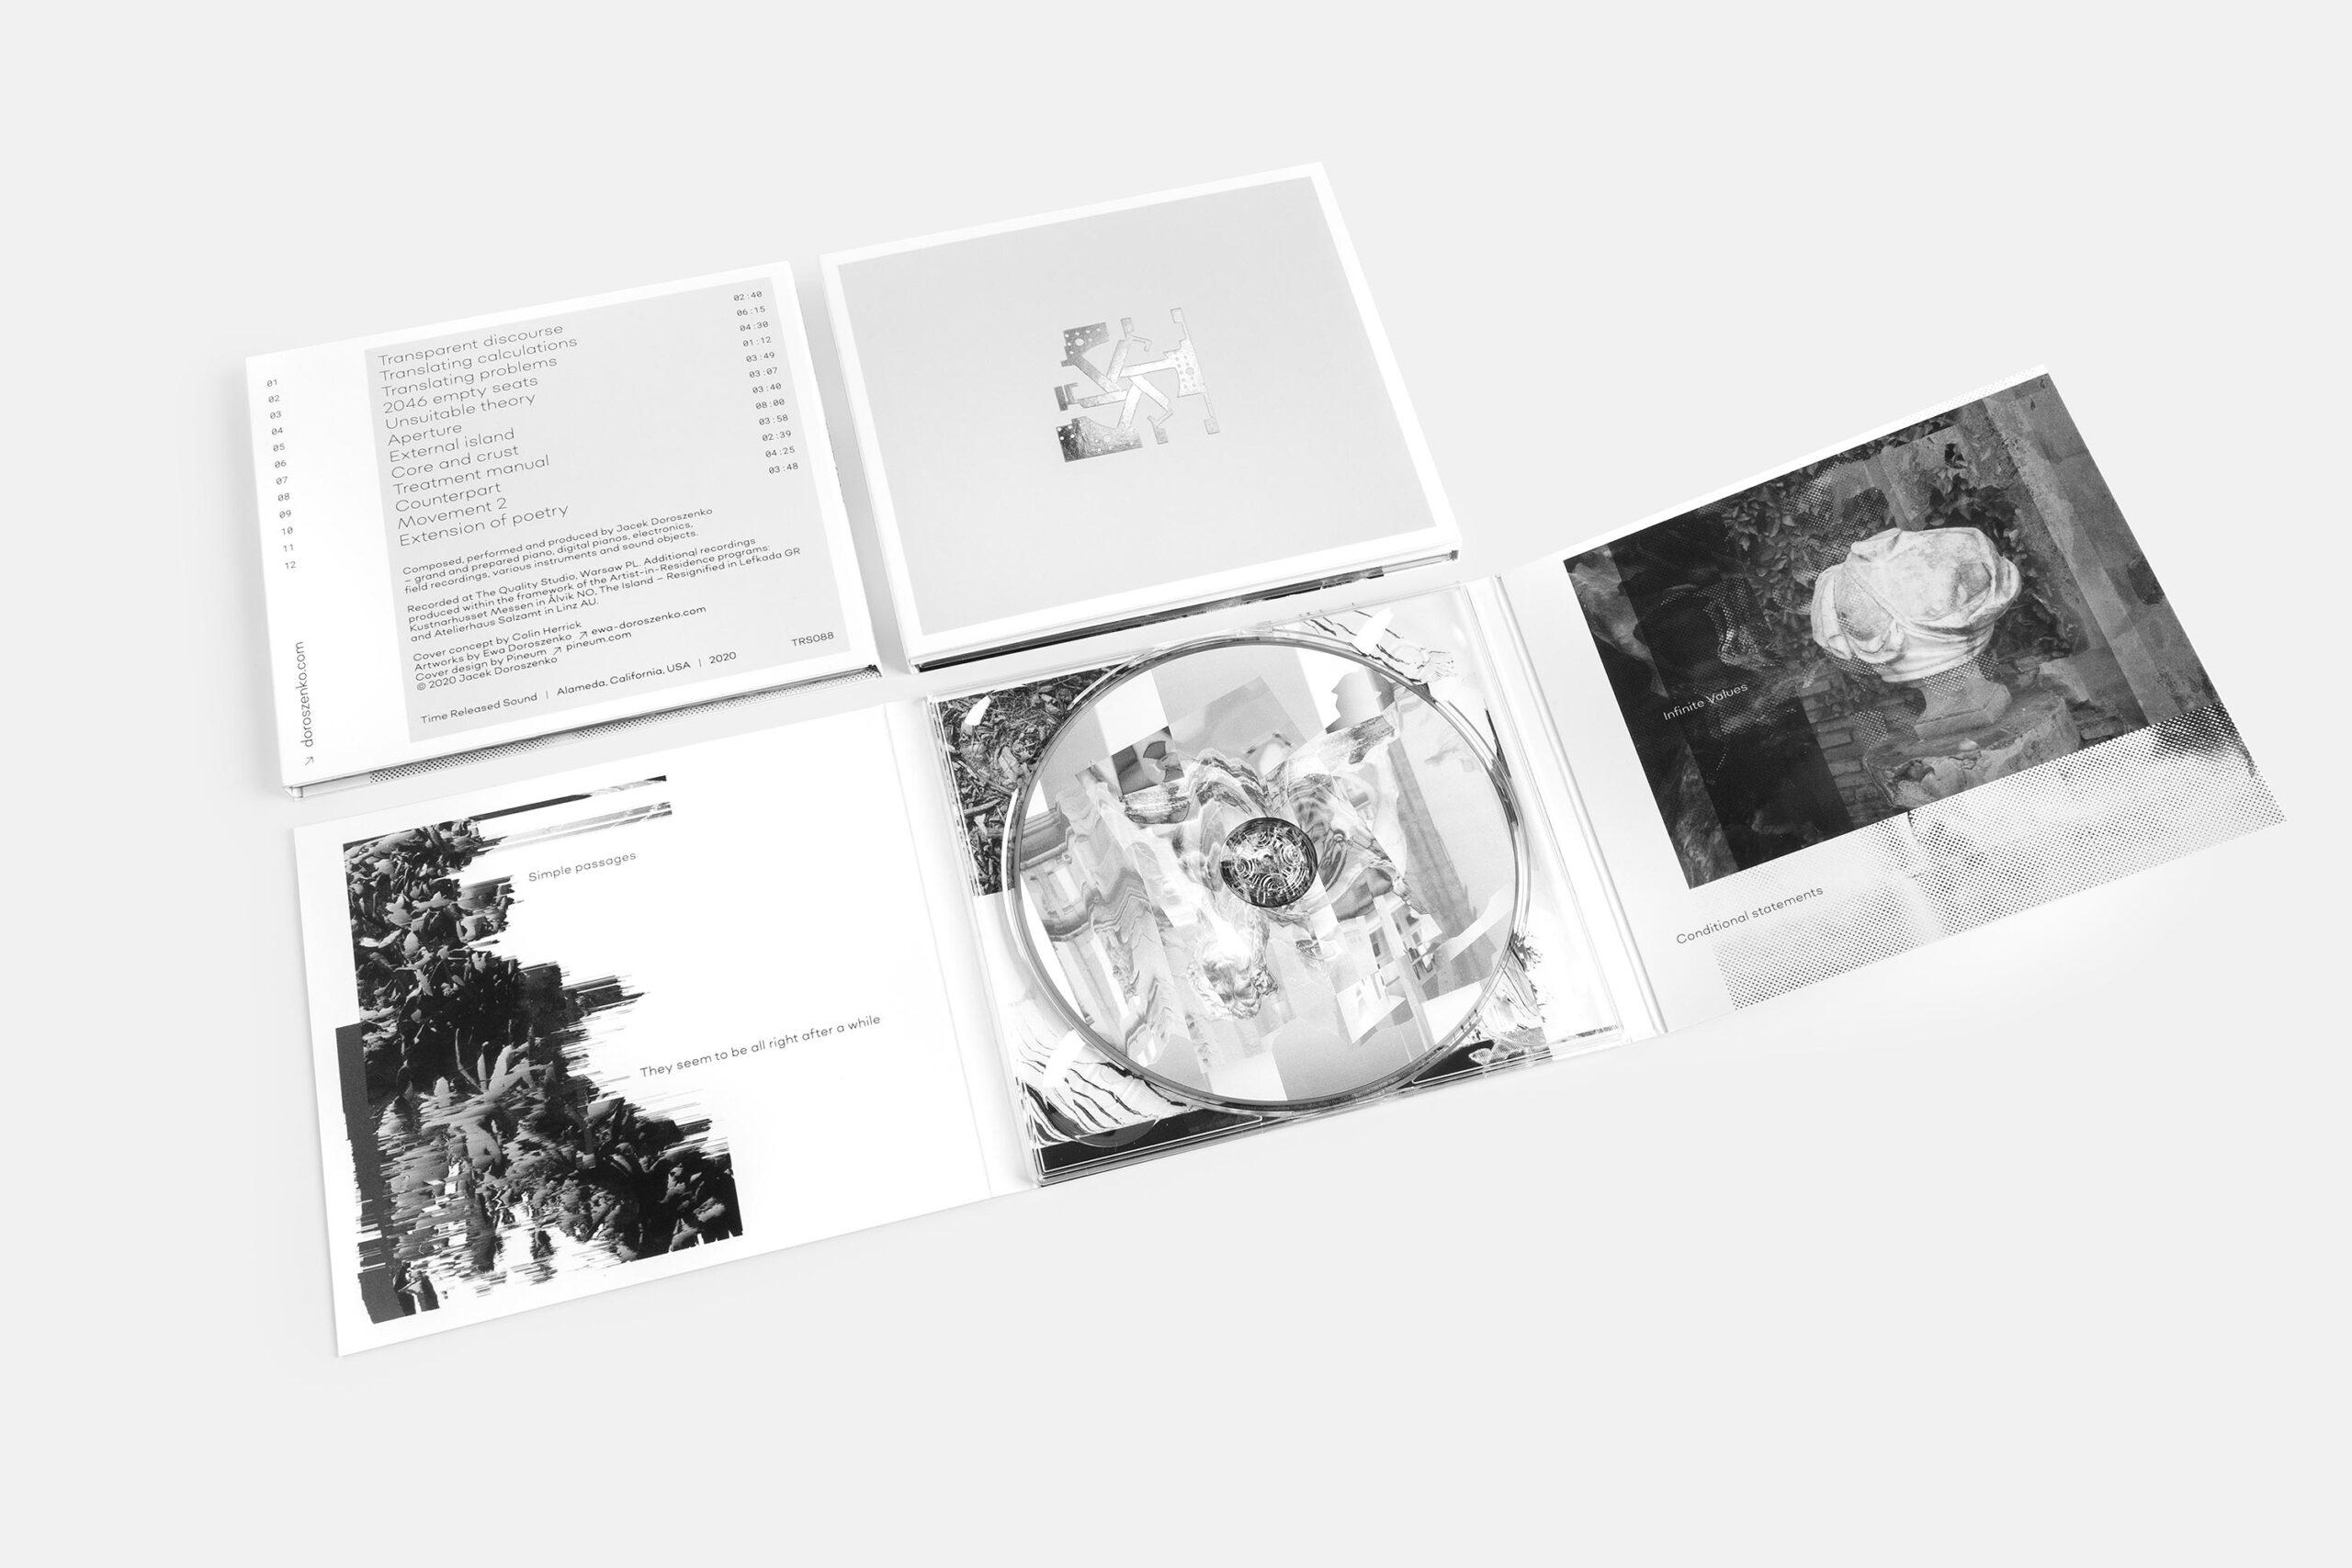 Jacek Doroszenko - Infinite Values, music album 11